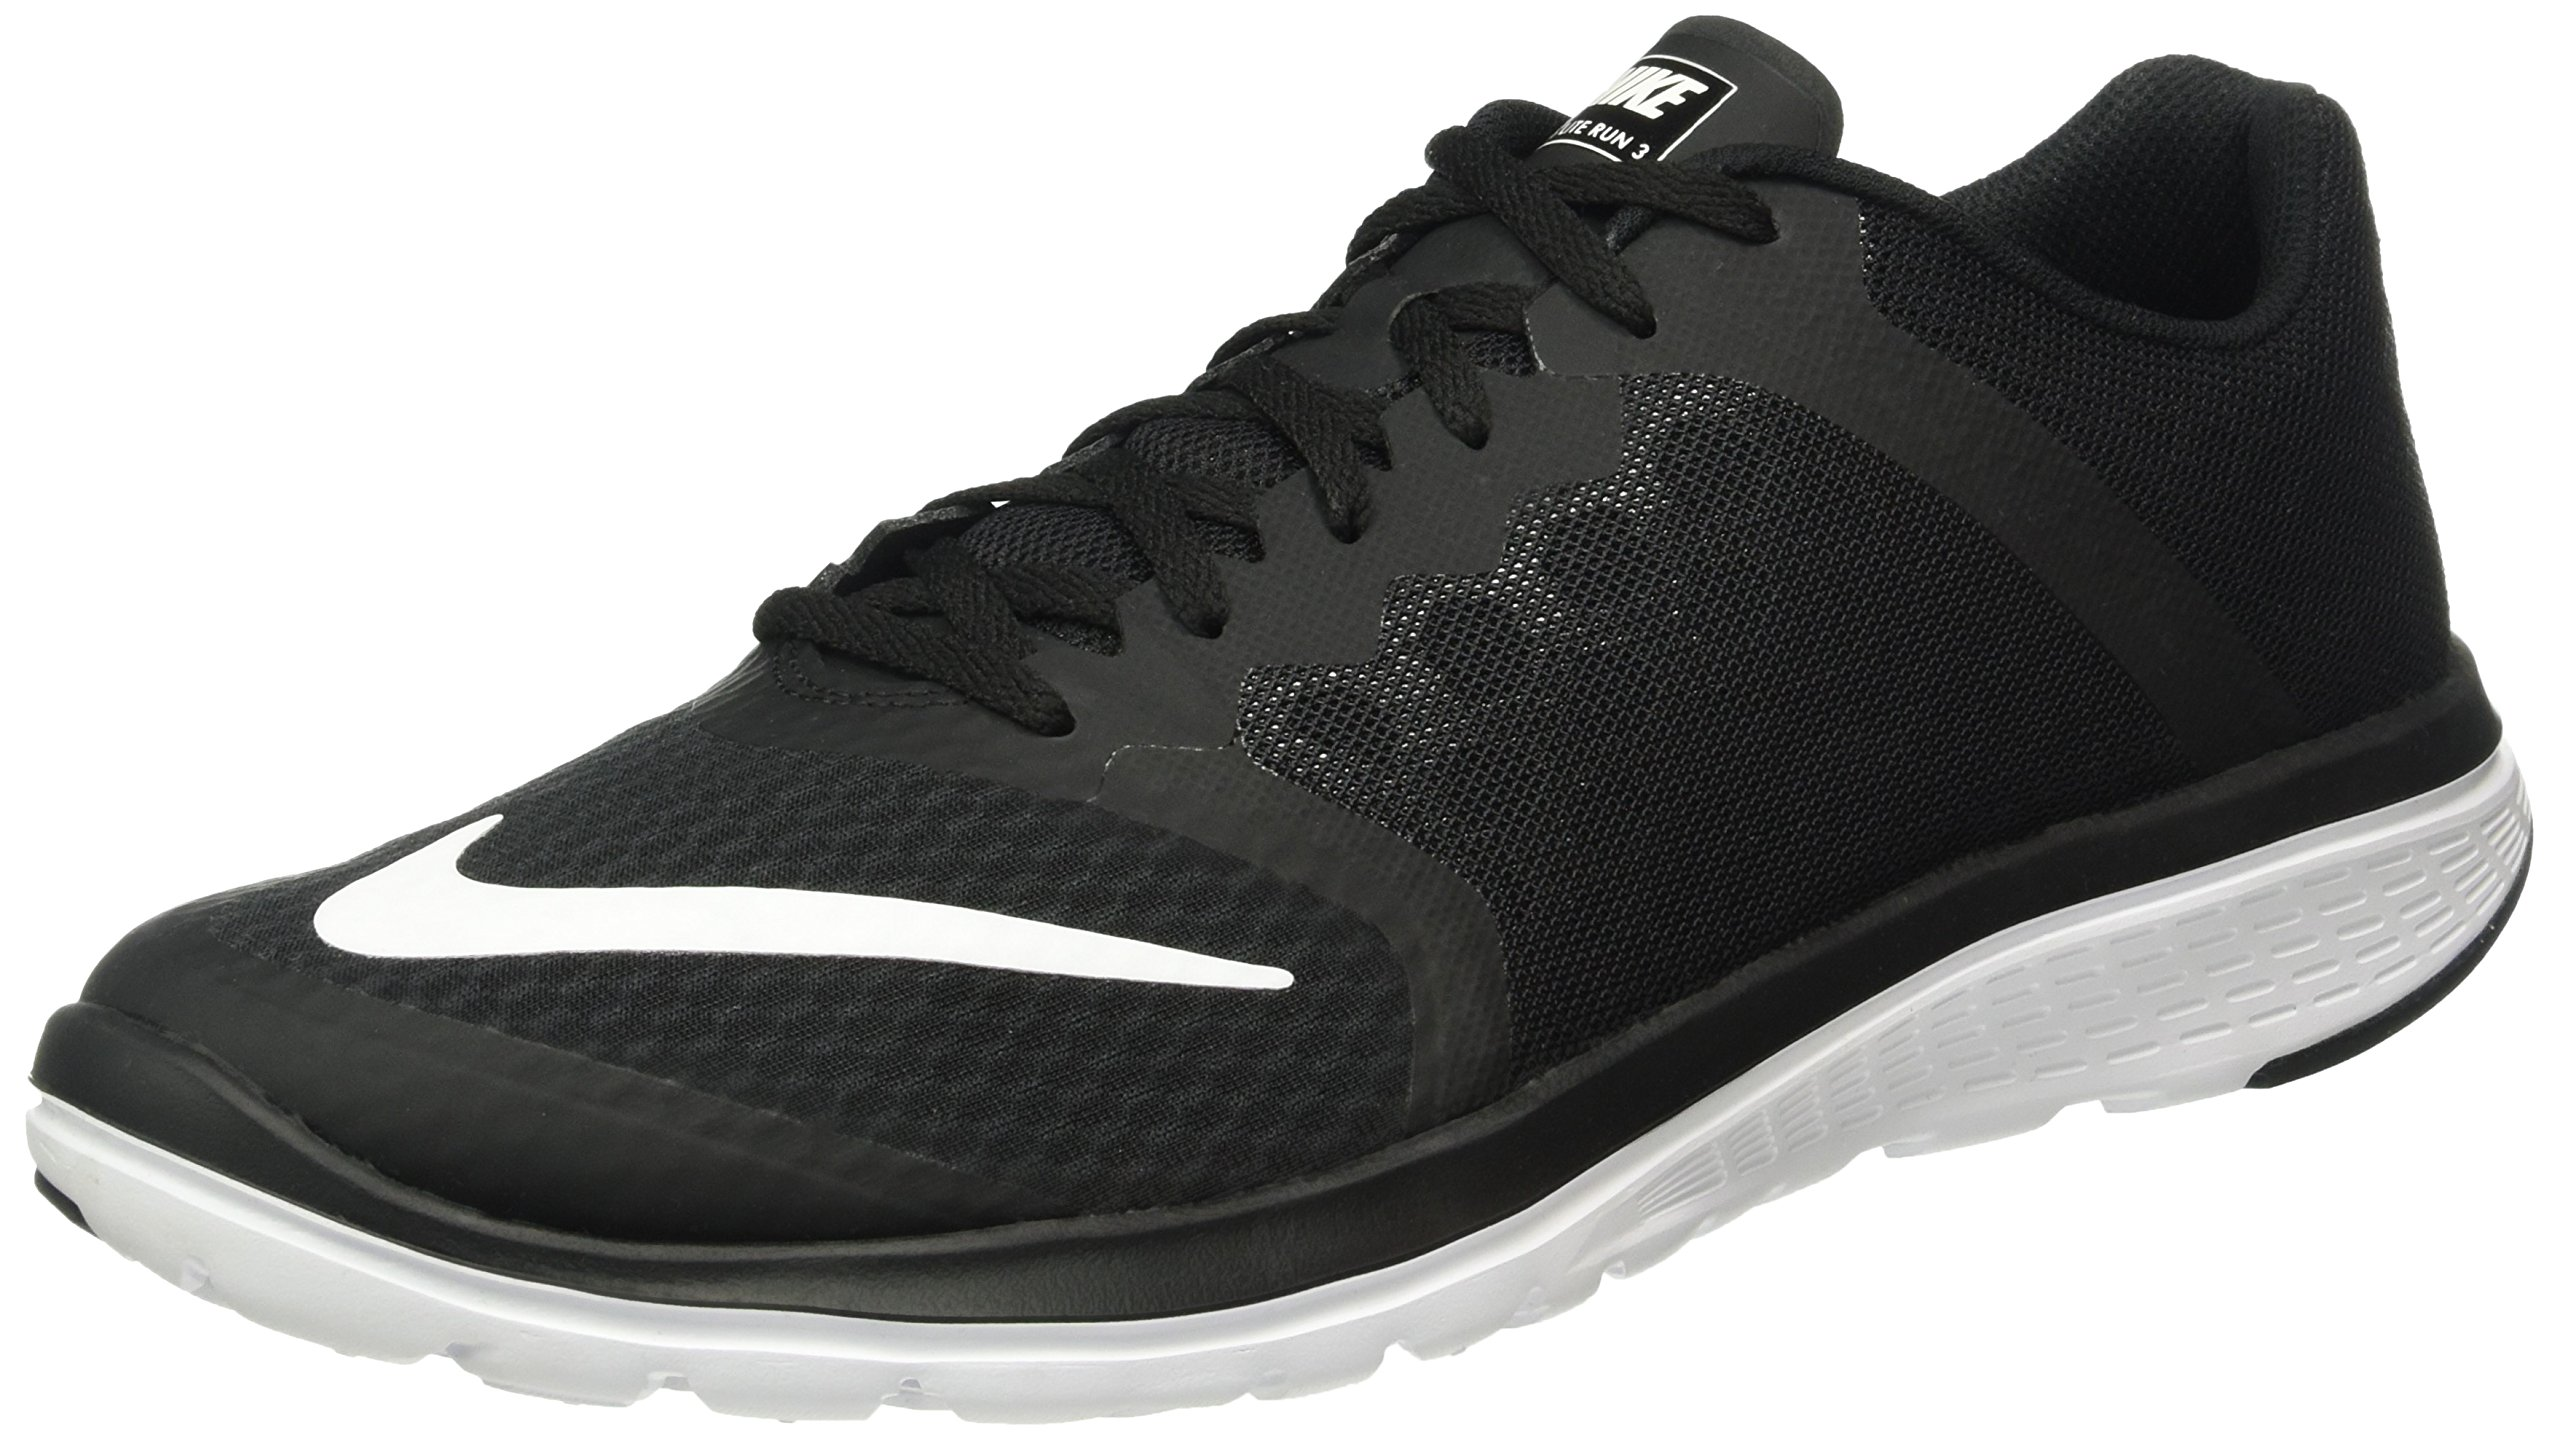 Nike Men's FS Lite Run 3 Running Shoe